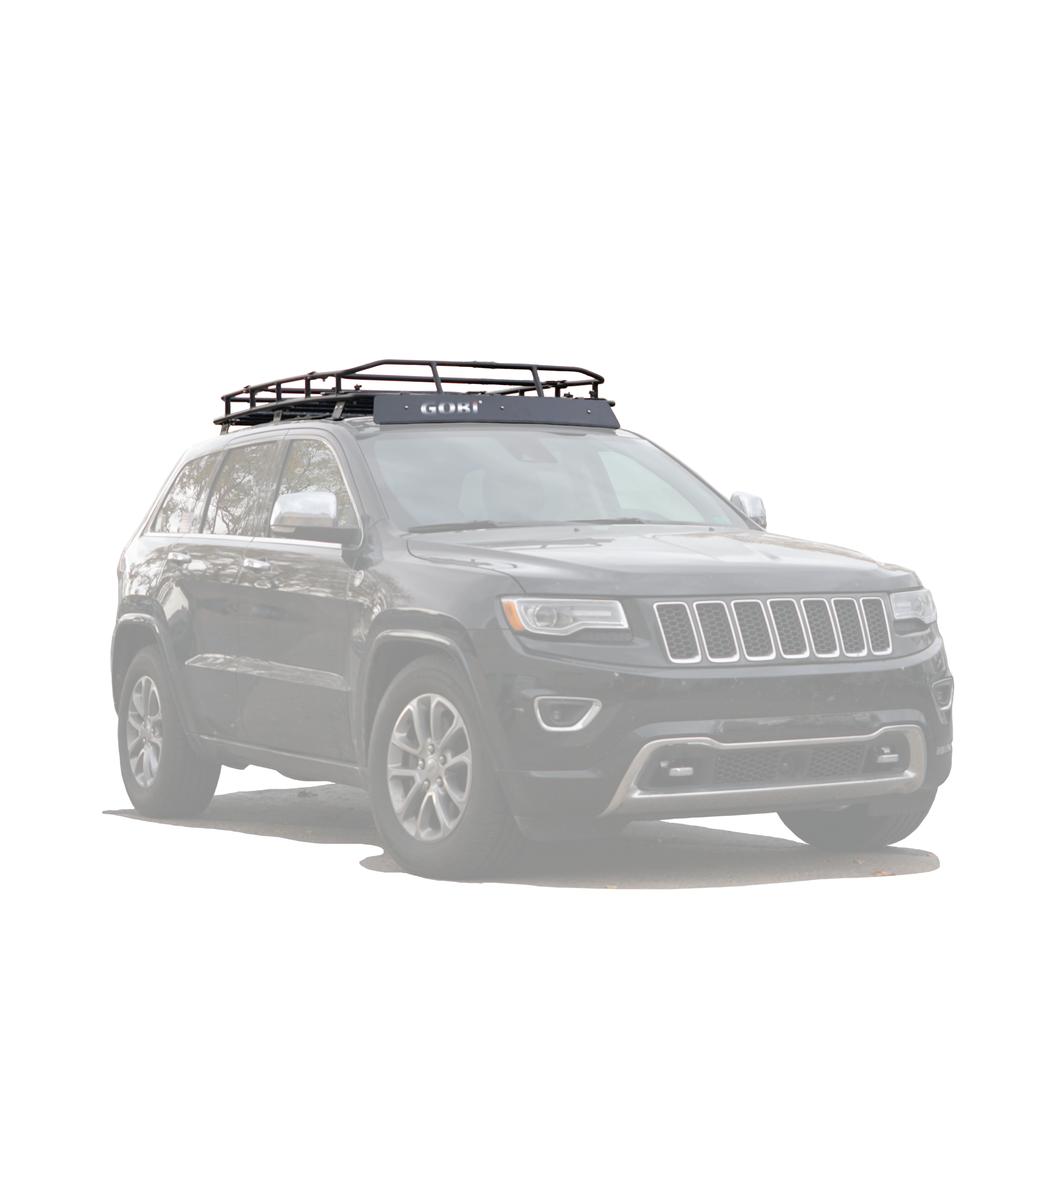 Gobi Jeep Grand Cherokee Wk2 Ranger Rack No Sunroof